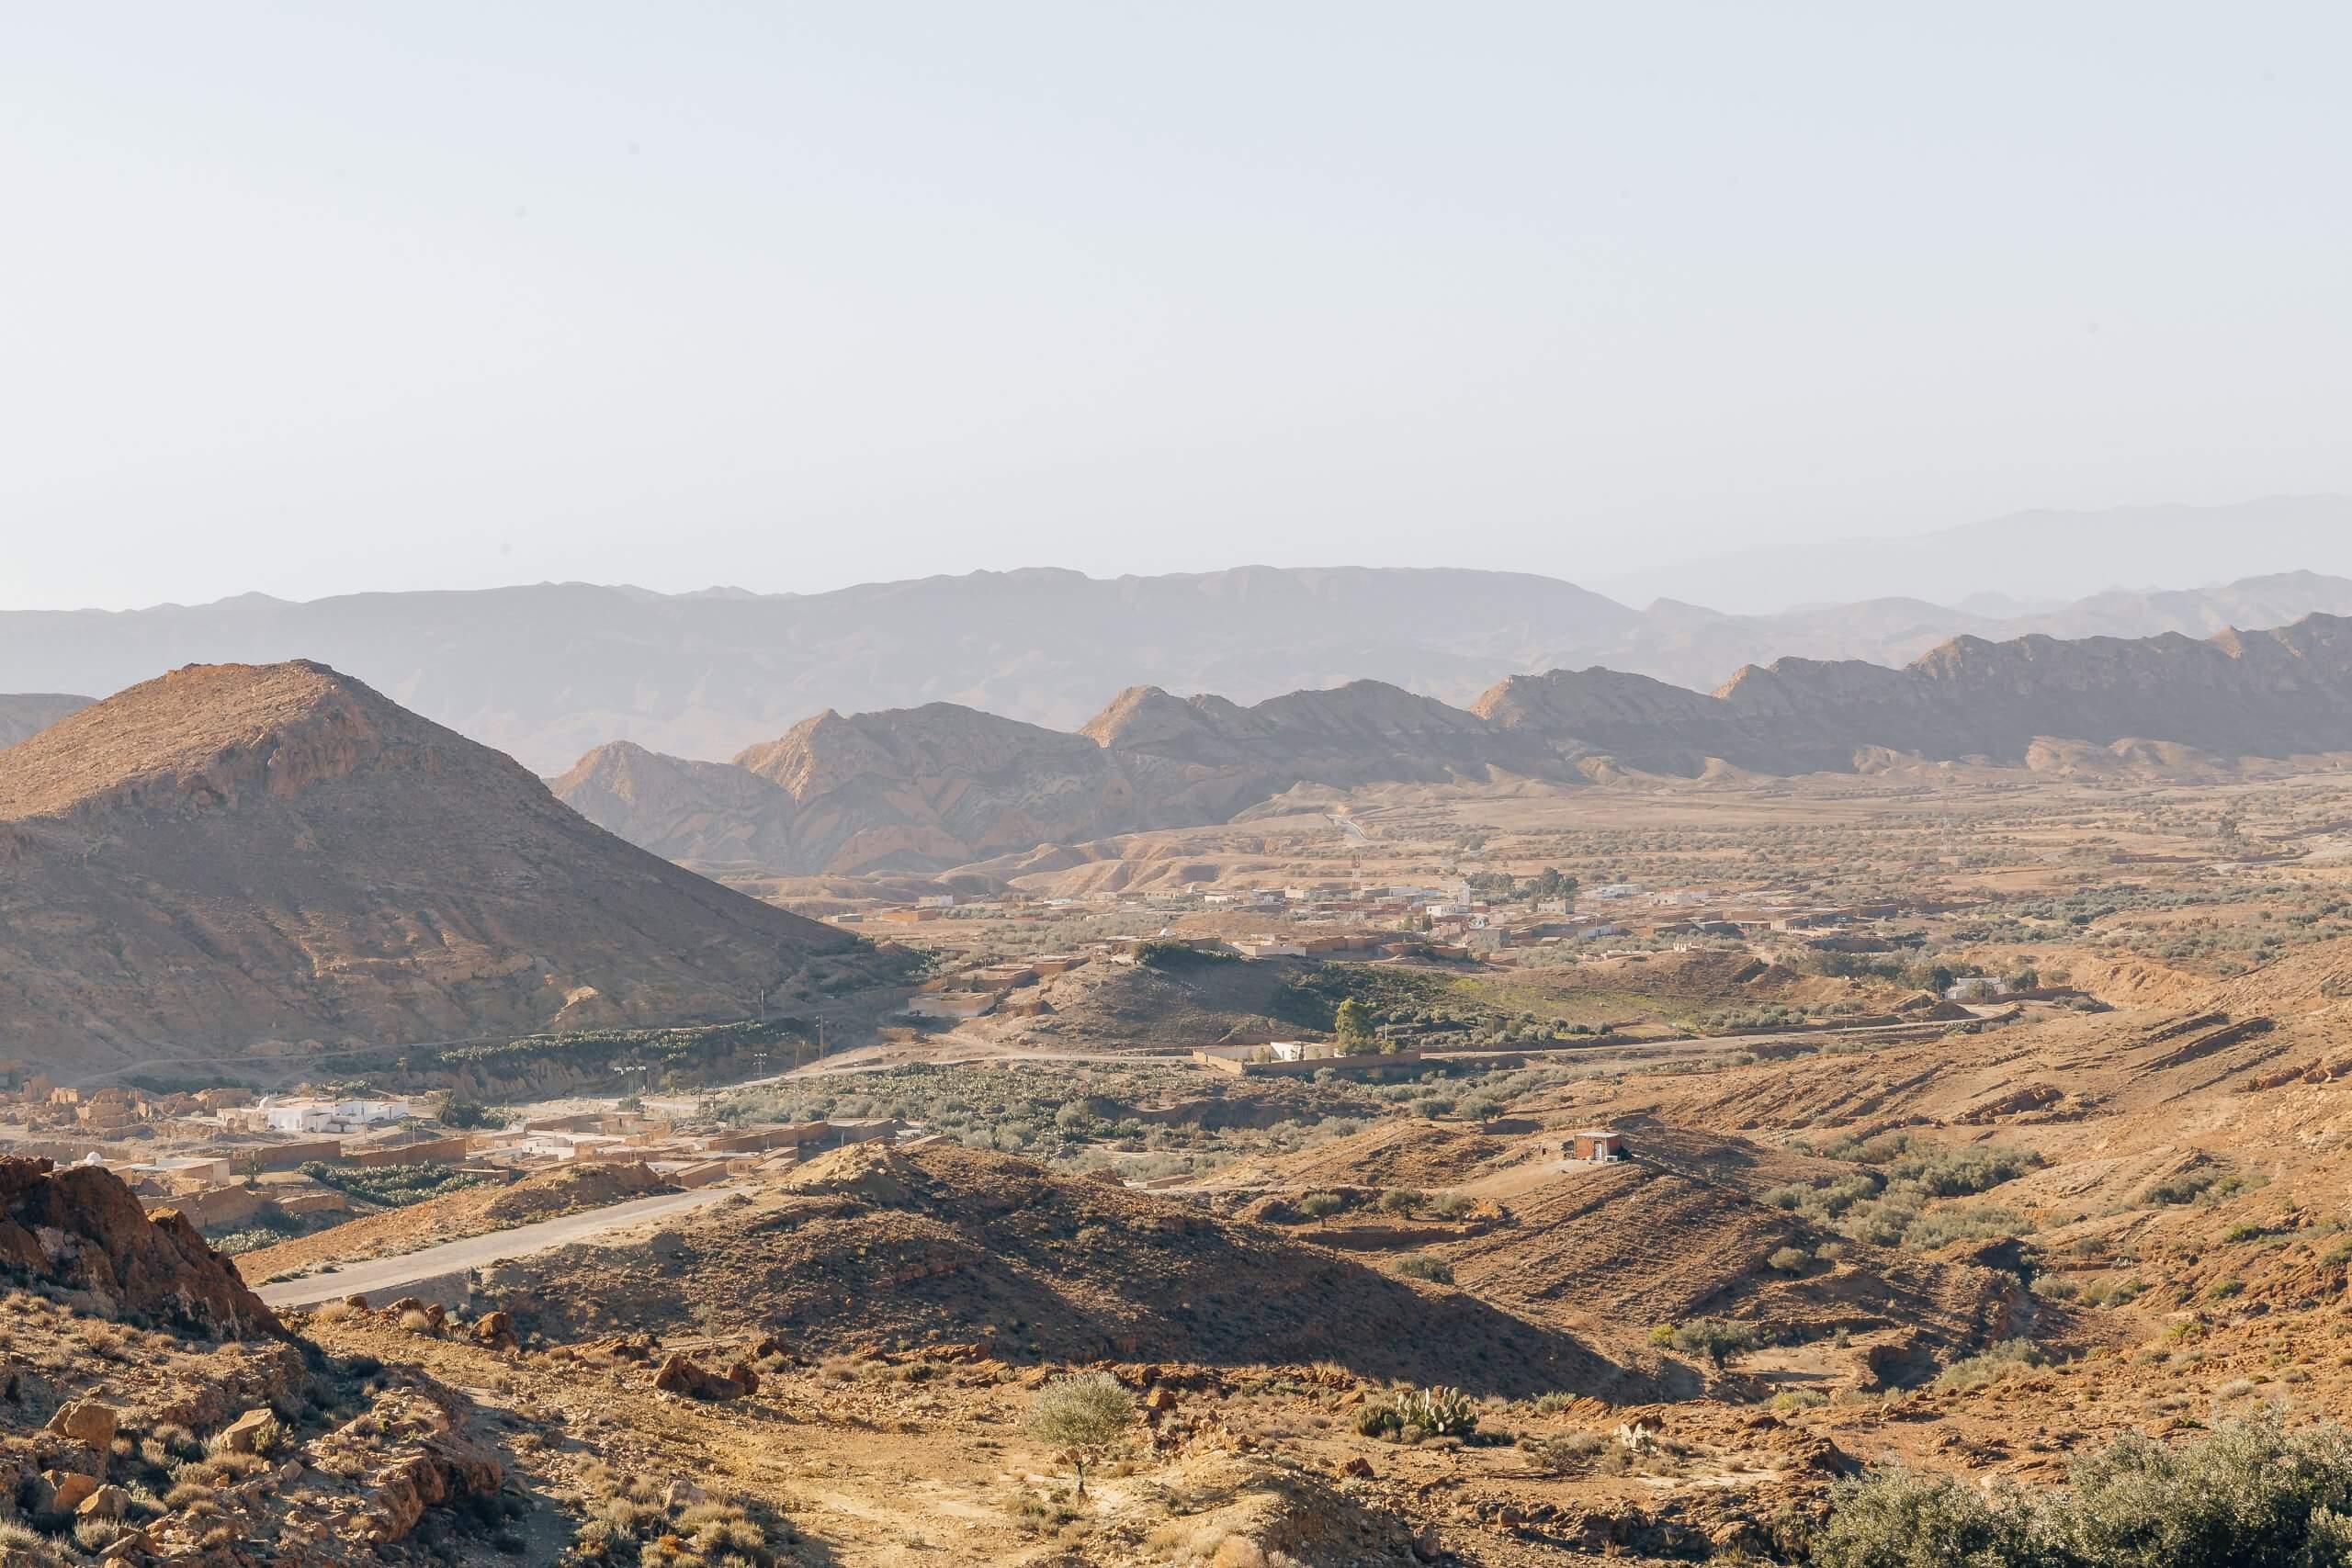 spektakuläre Berglandschaft rund um Sened